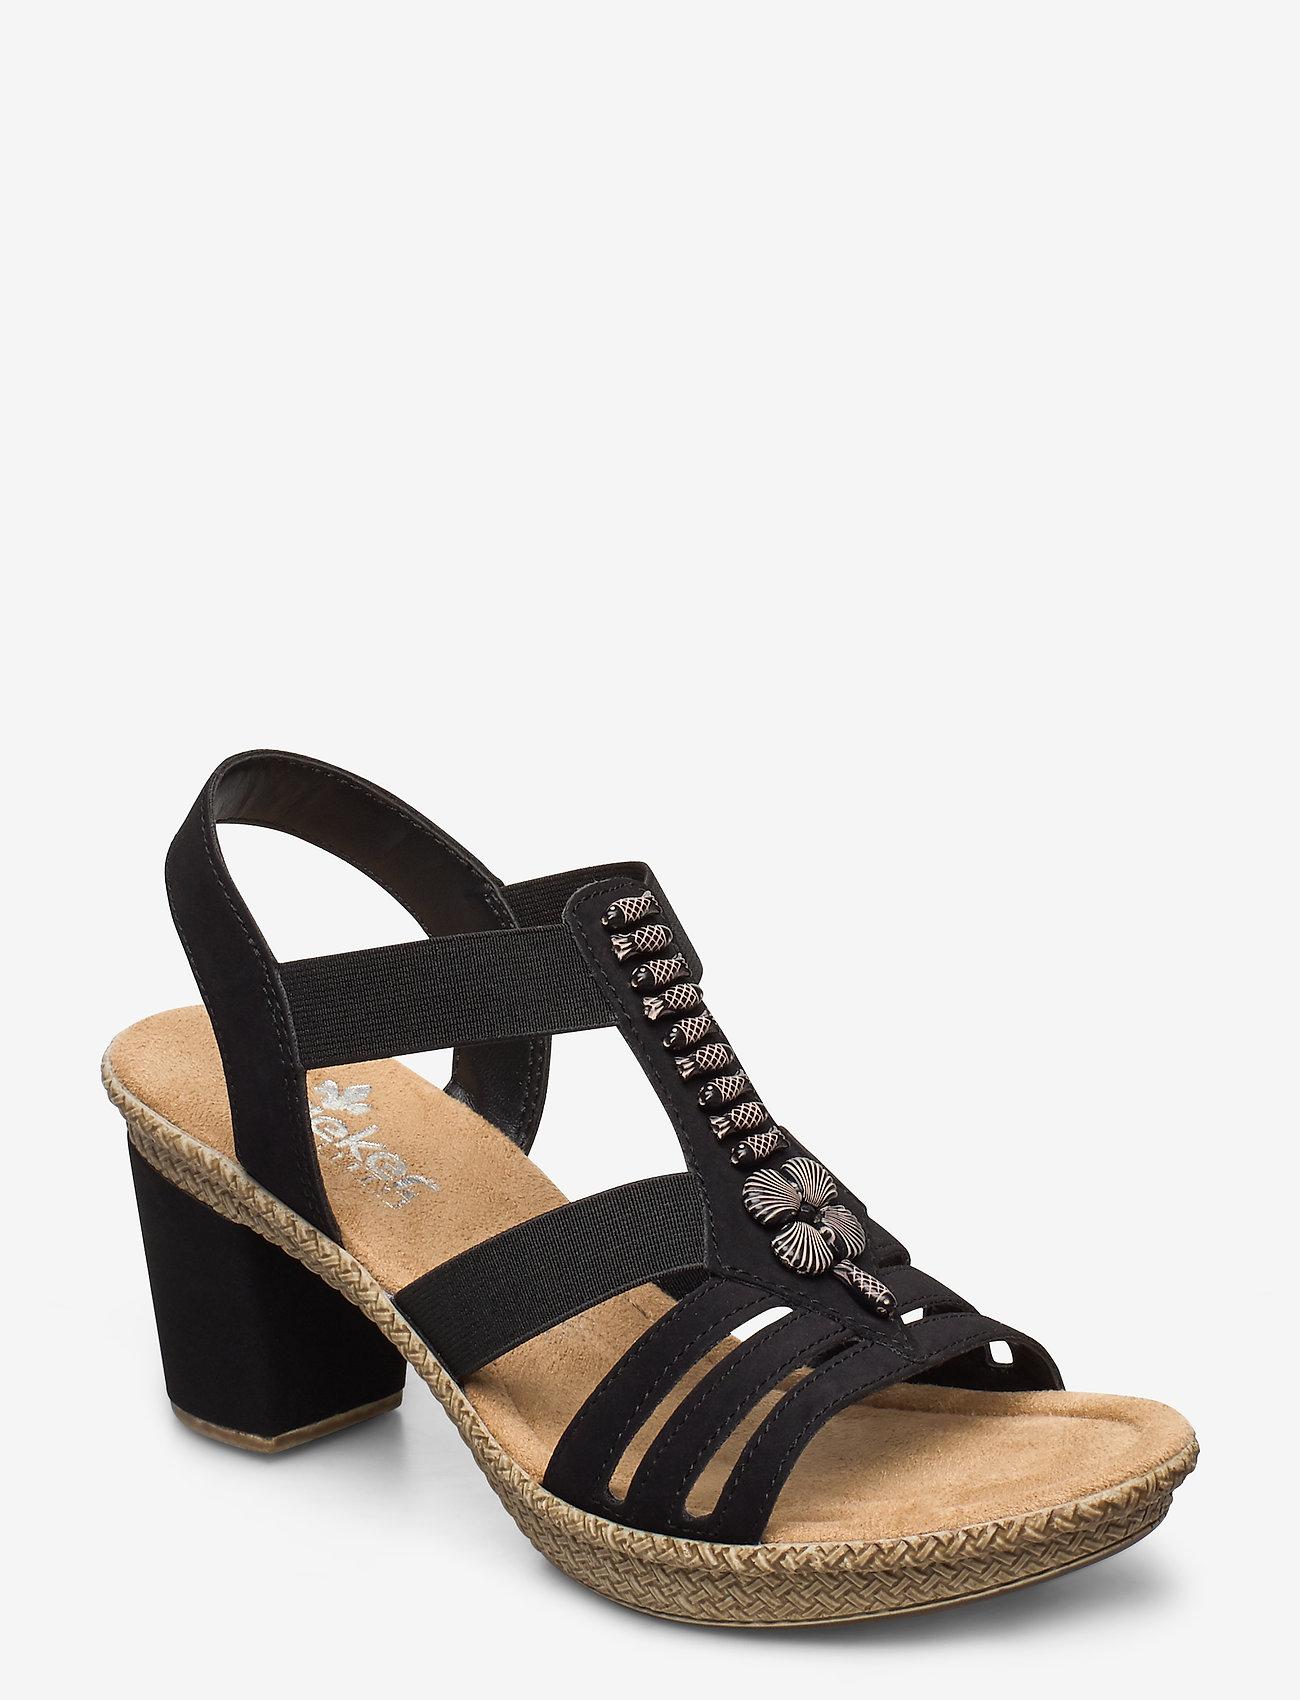 Rieker - 66506-00 - heeled sandals - black